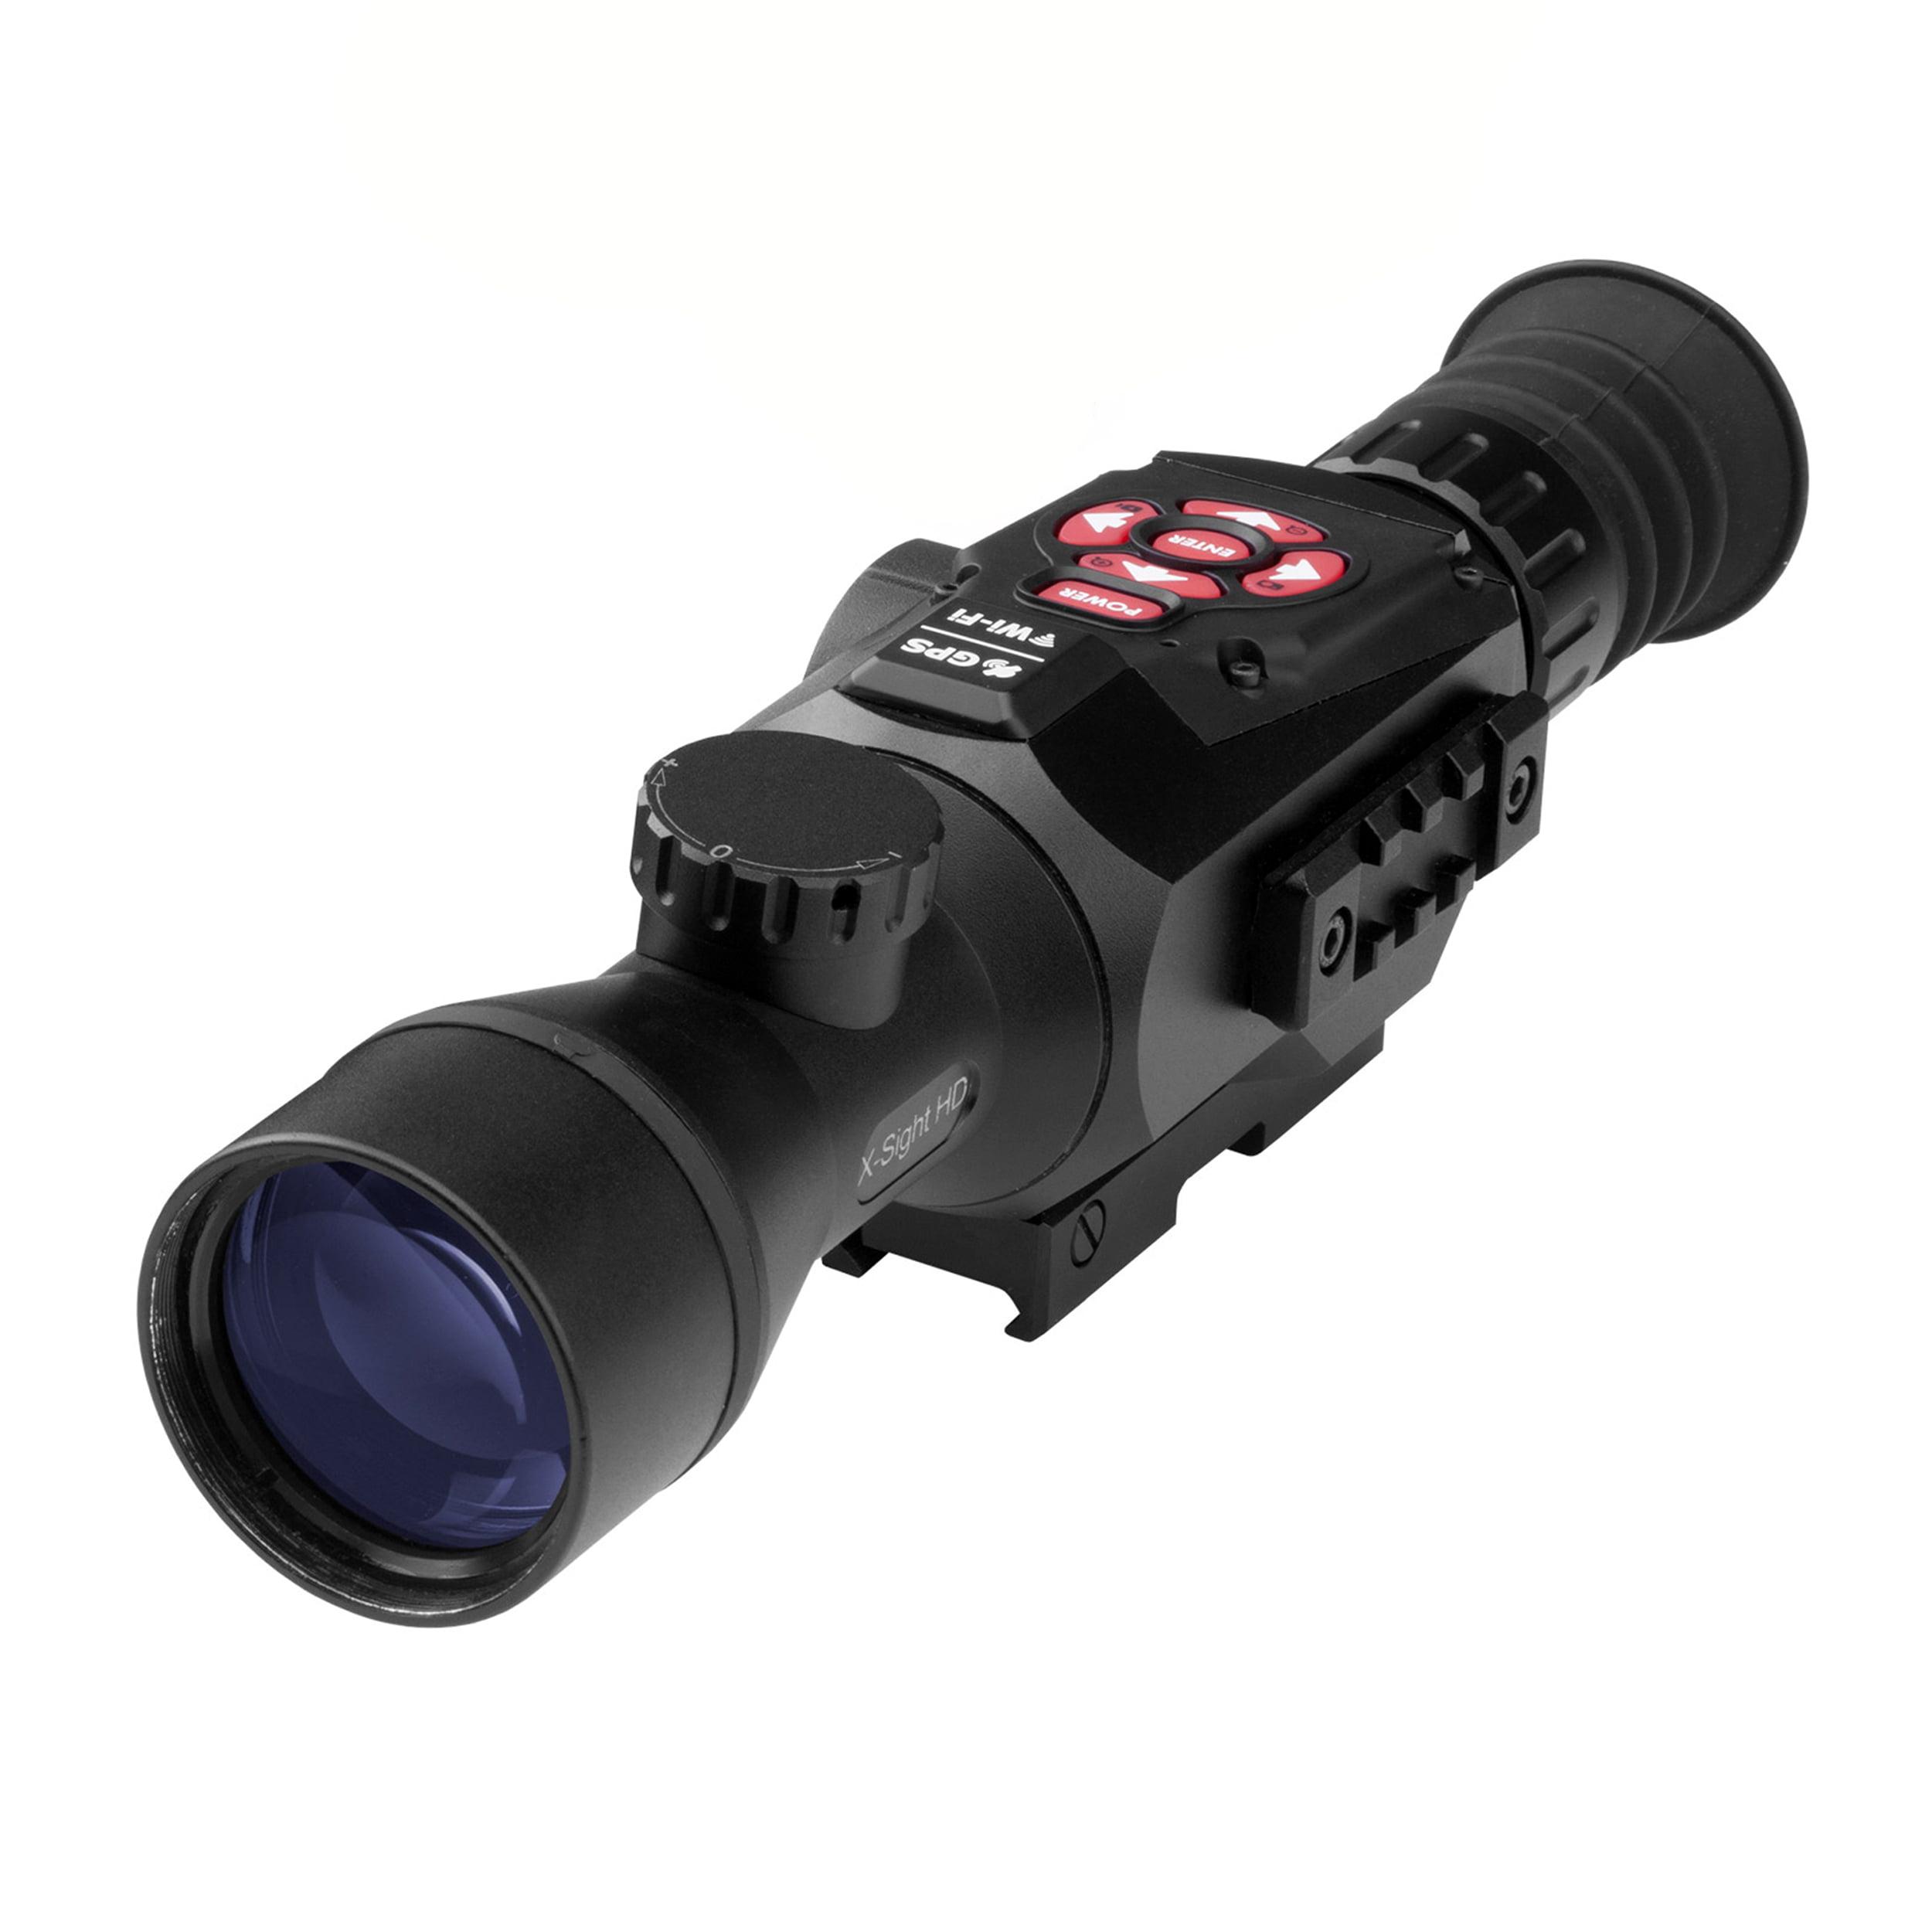 ATN Corporation X-Sight II long gun optic 3-14x Smart HD Digital NV, Matte Black